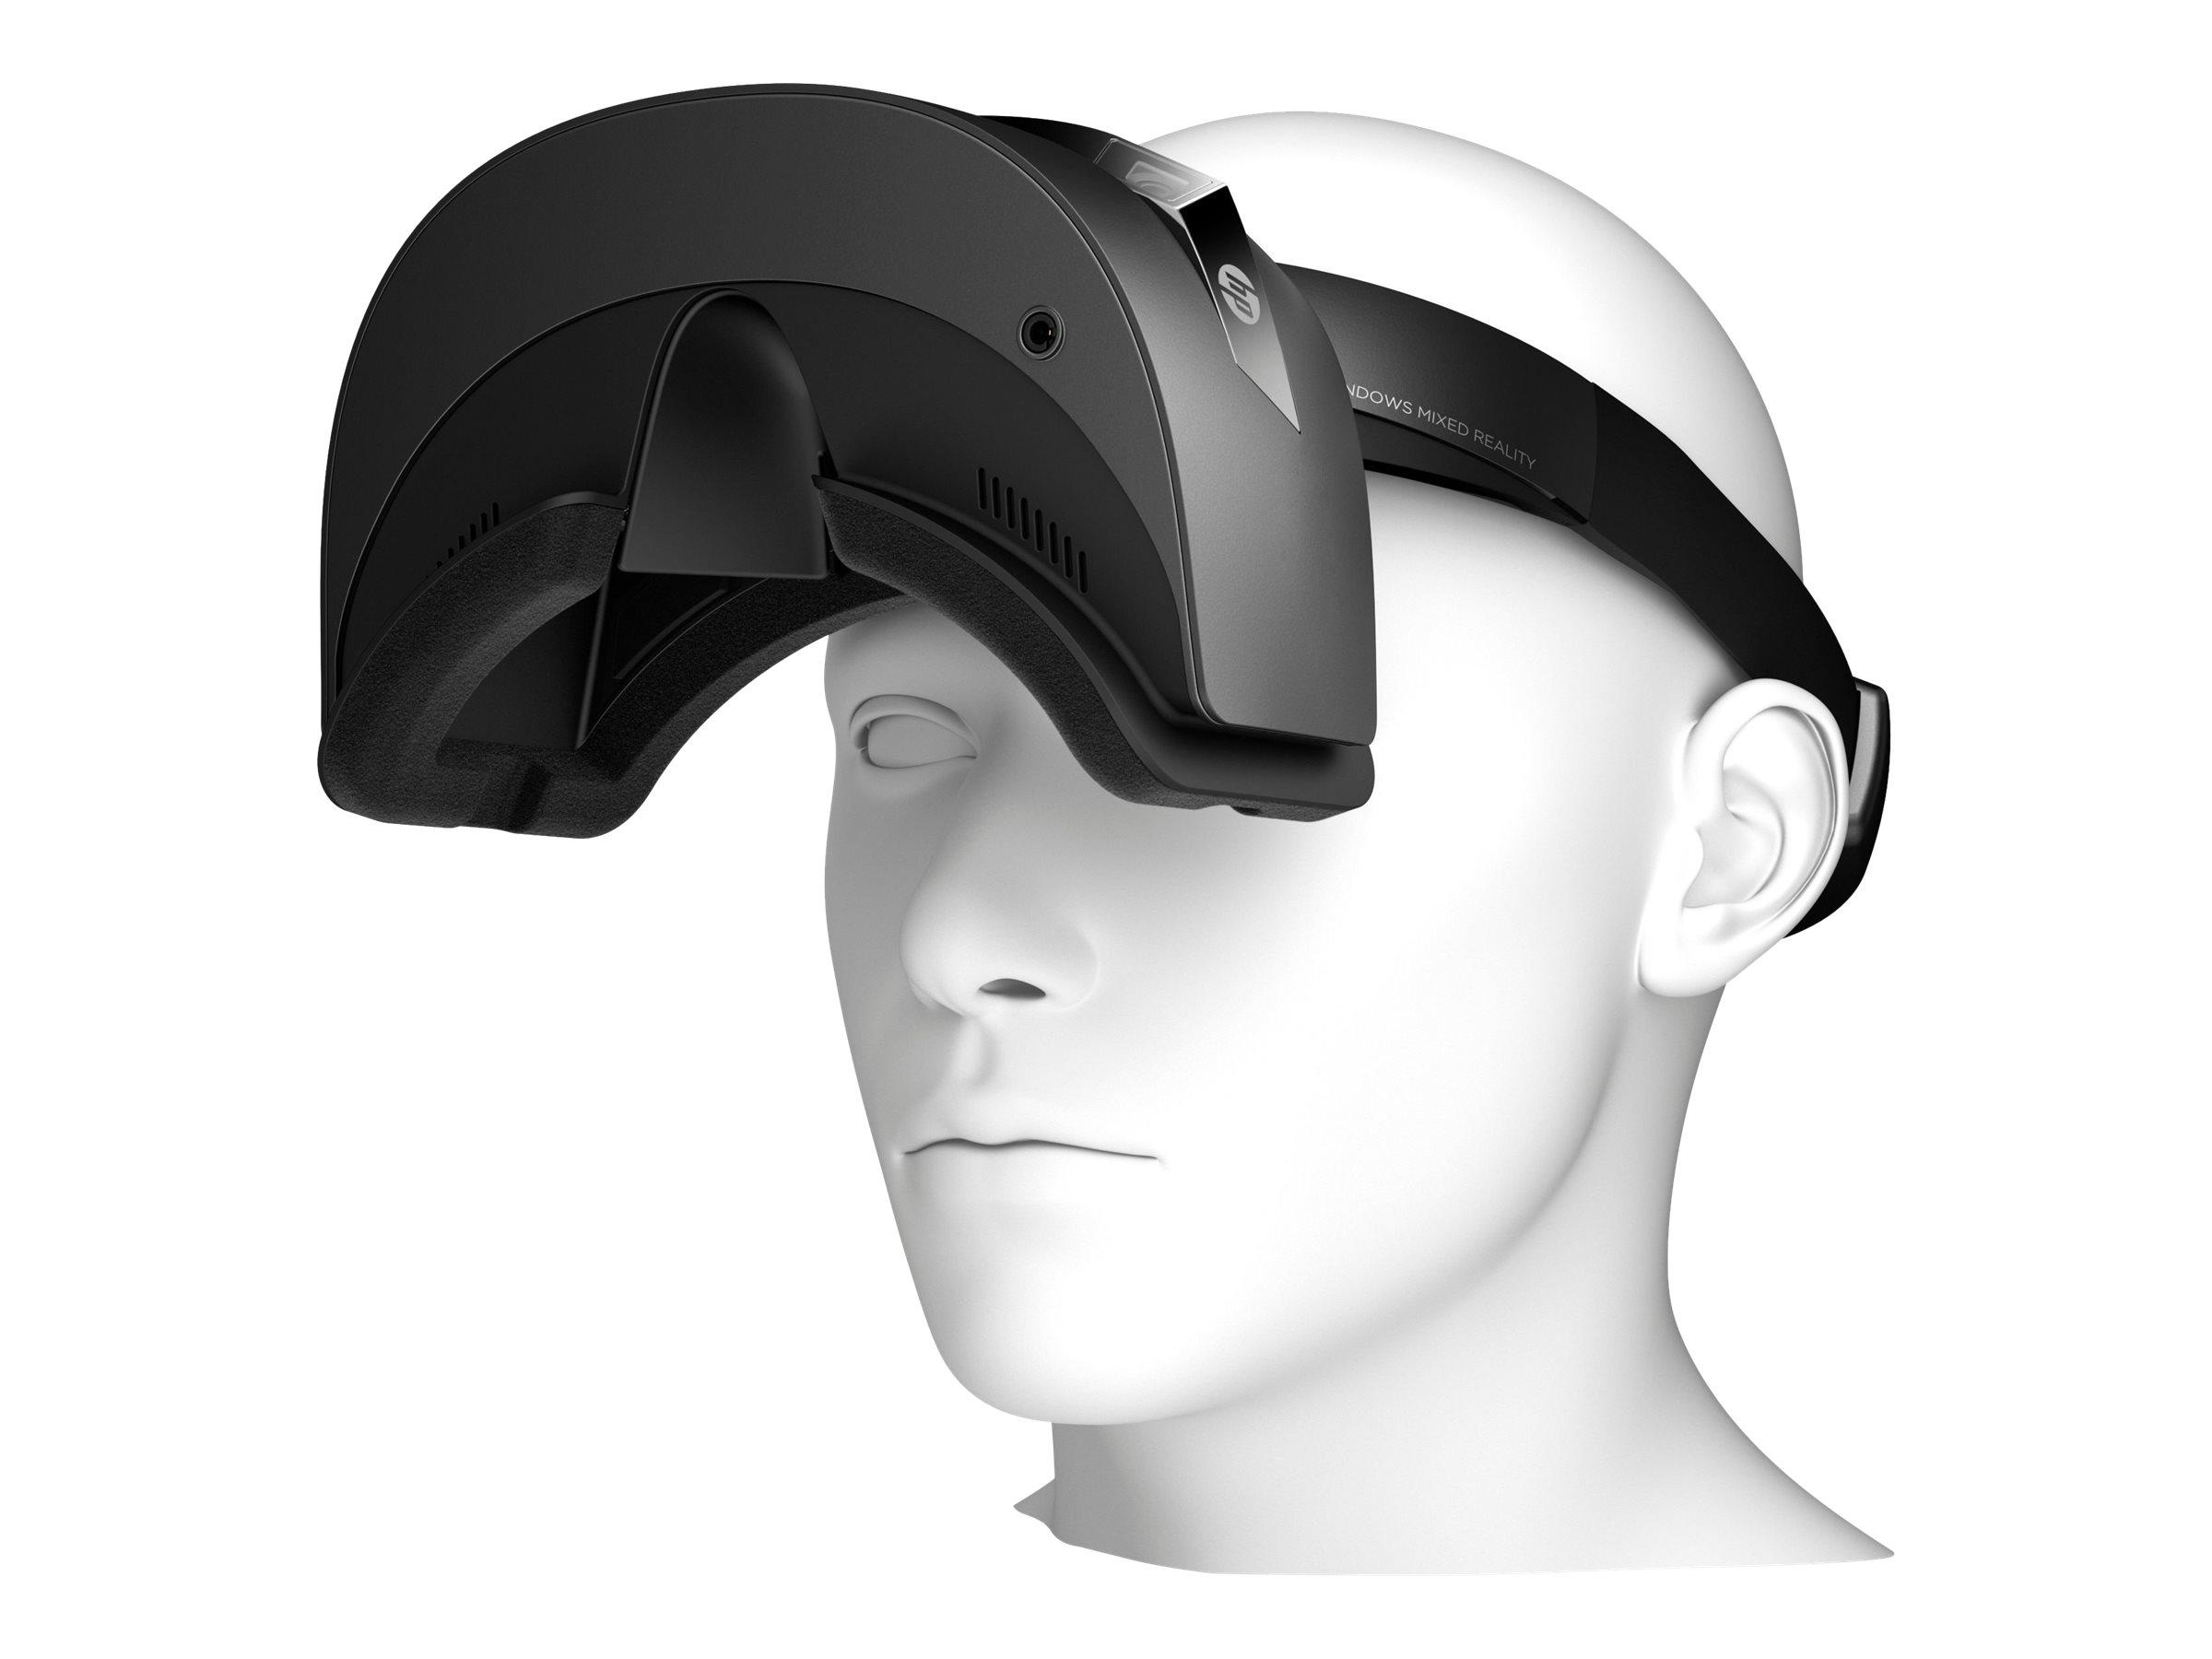 HP Windows Mixed Reality Headset VR1000-100nn - Virtual-Reality-Headset - tragbar - 1440 x 1440 - HDMI - Jet Black